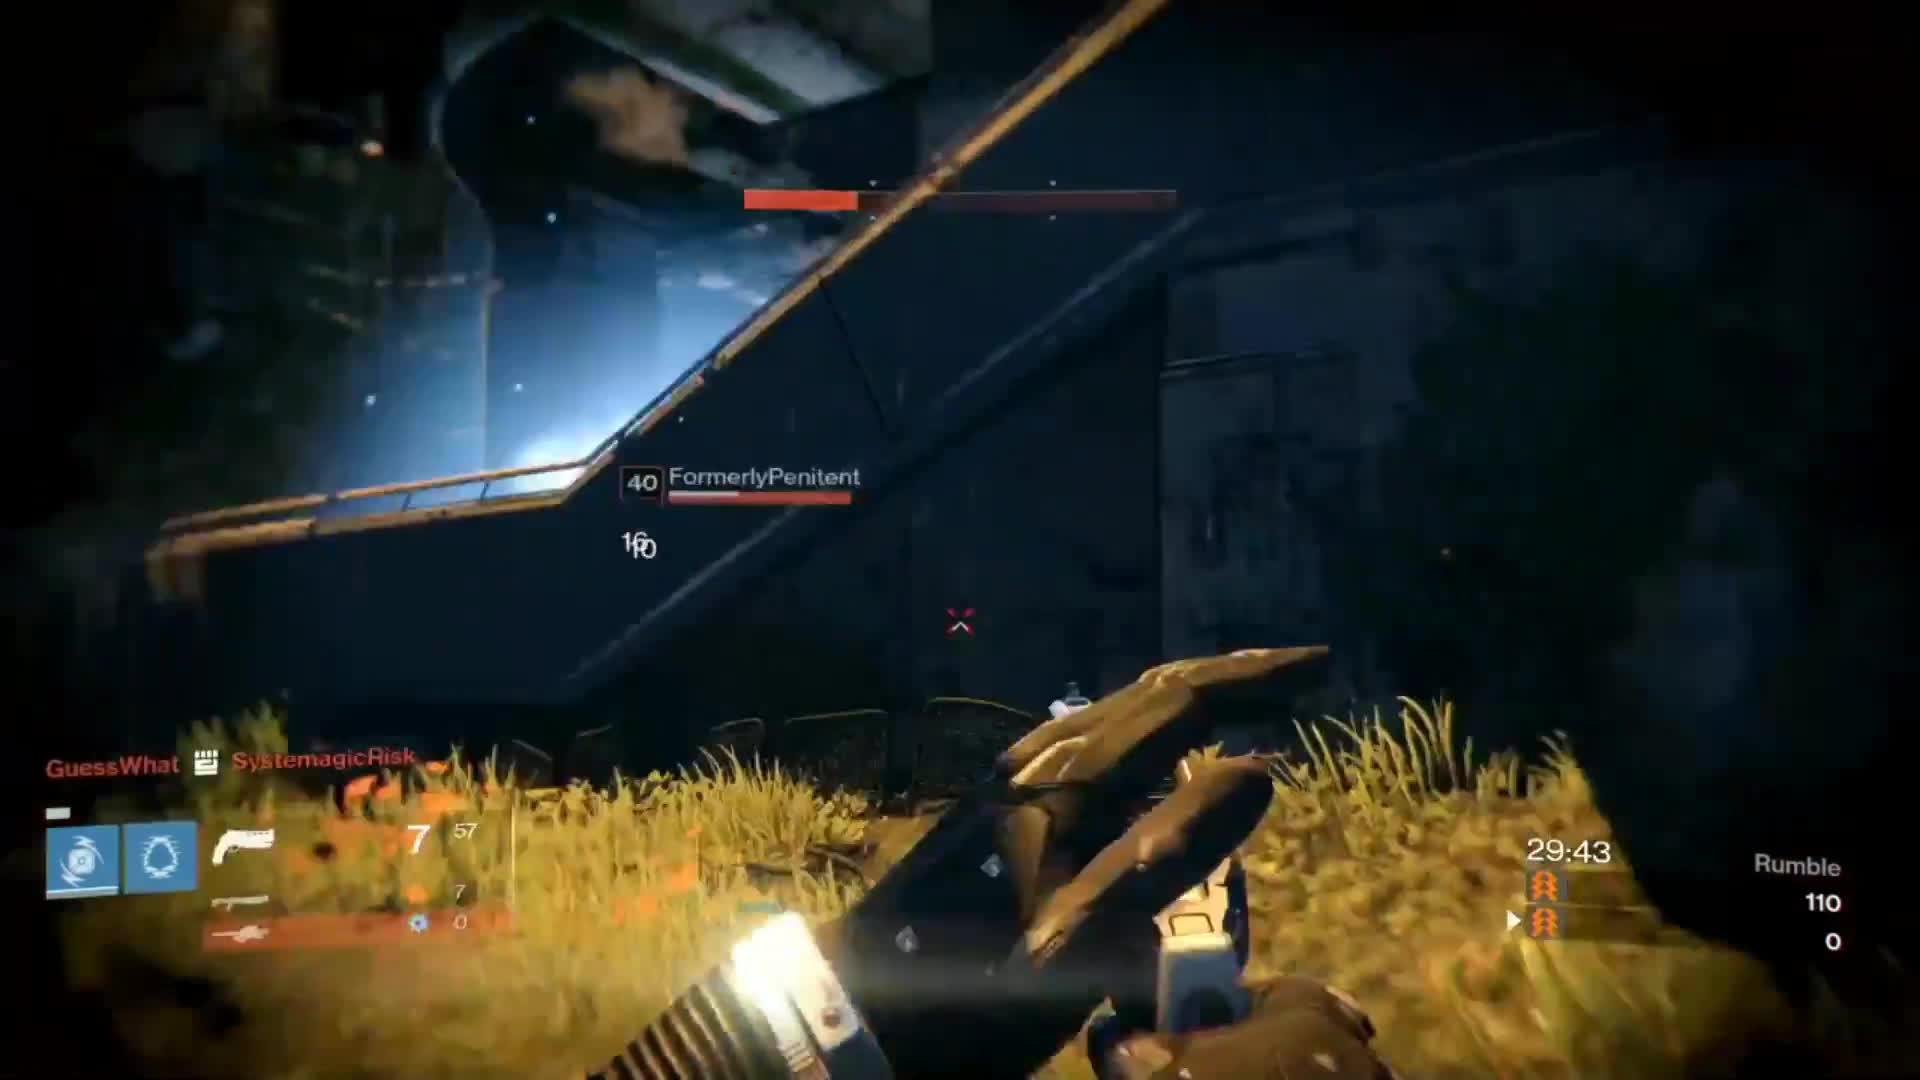 destiny, destiny - sandbox update reveal, livestream bungie, Destiny - Sandbox Update Reveal - Livestream Bungie GIFs